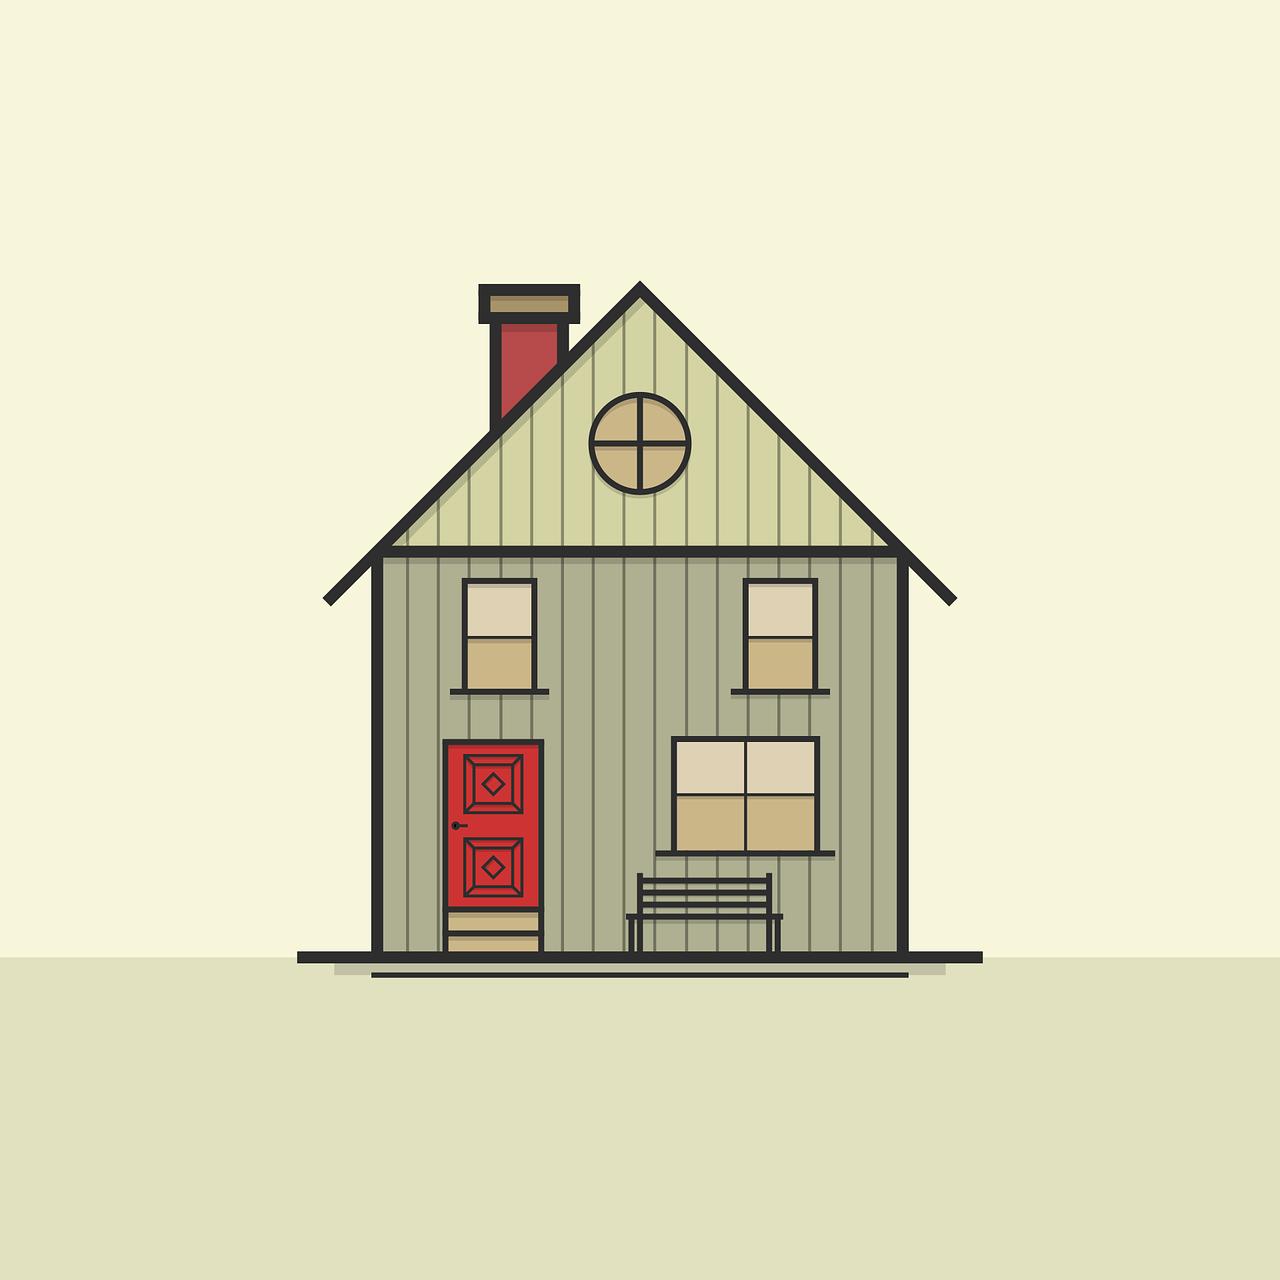 house, icon, symbol